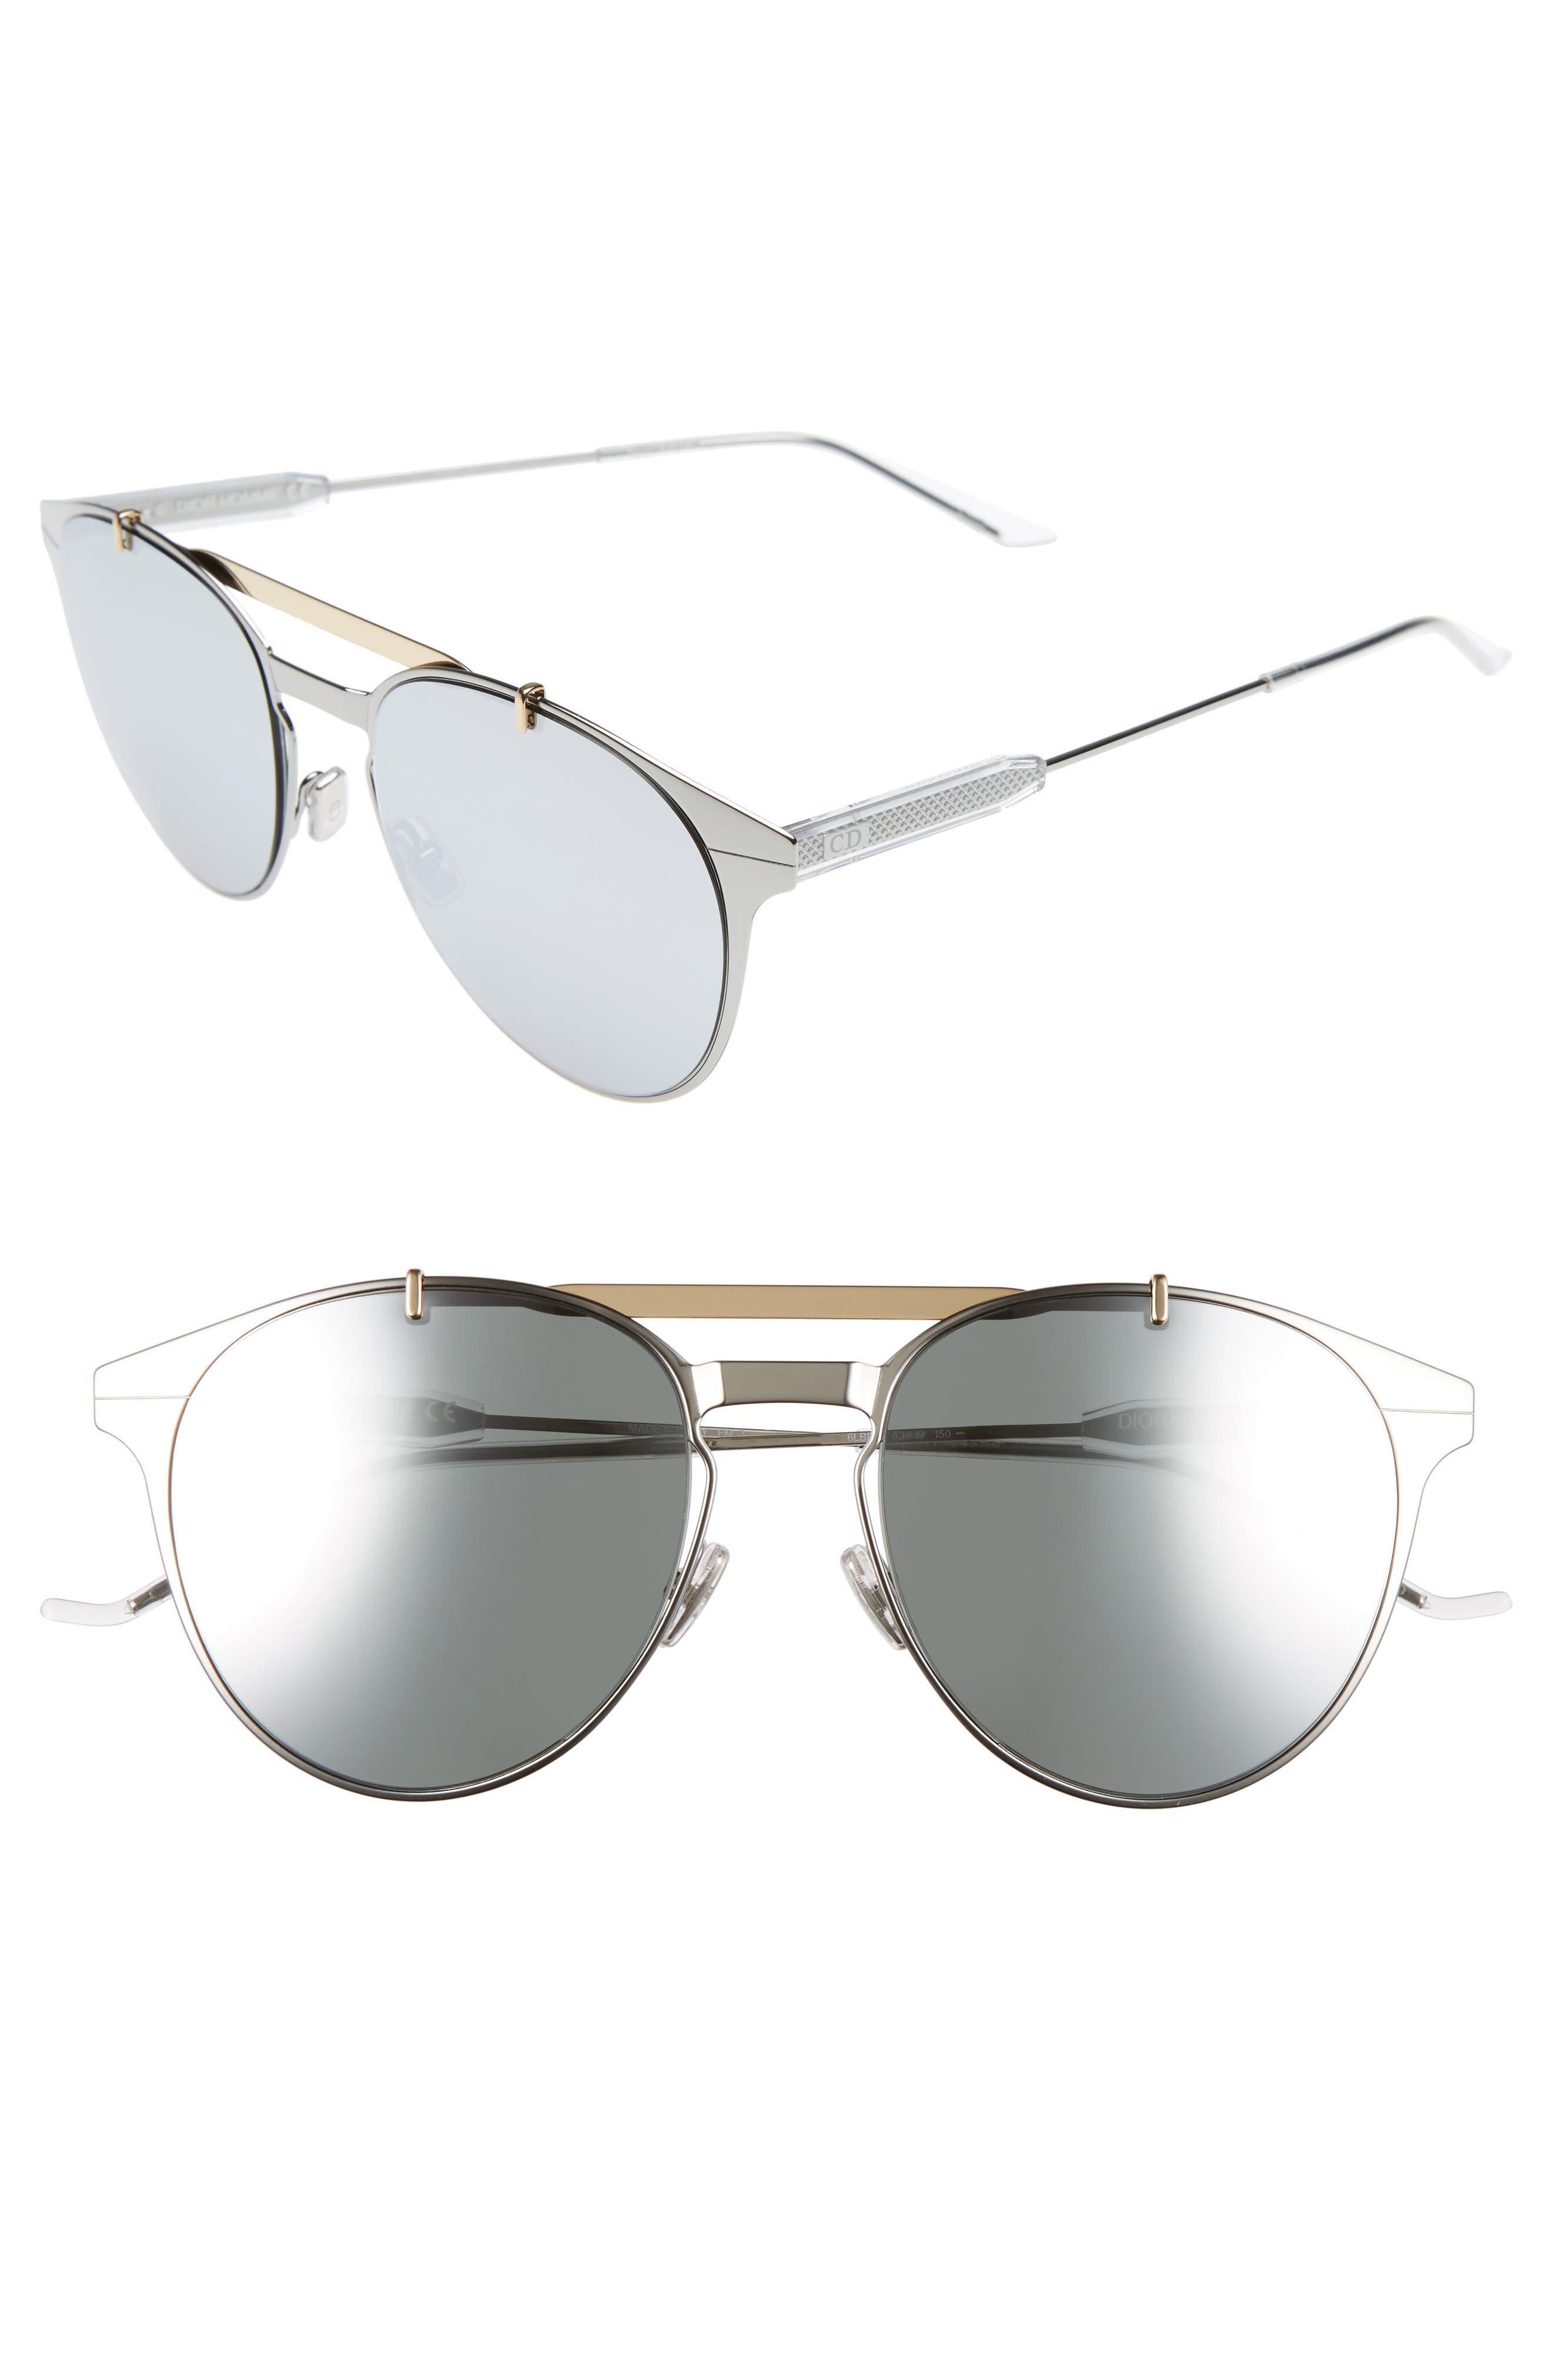 Motion 53mm Sunglasses,                             Main thumbnail 1, color,                             GREY